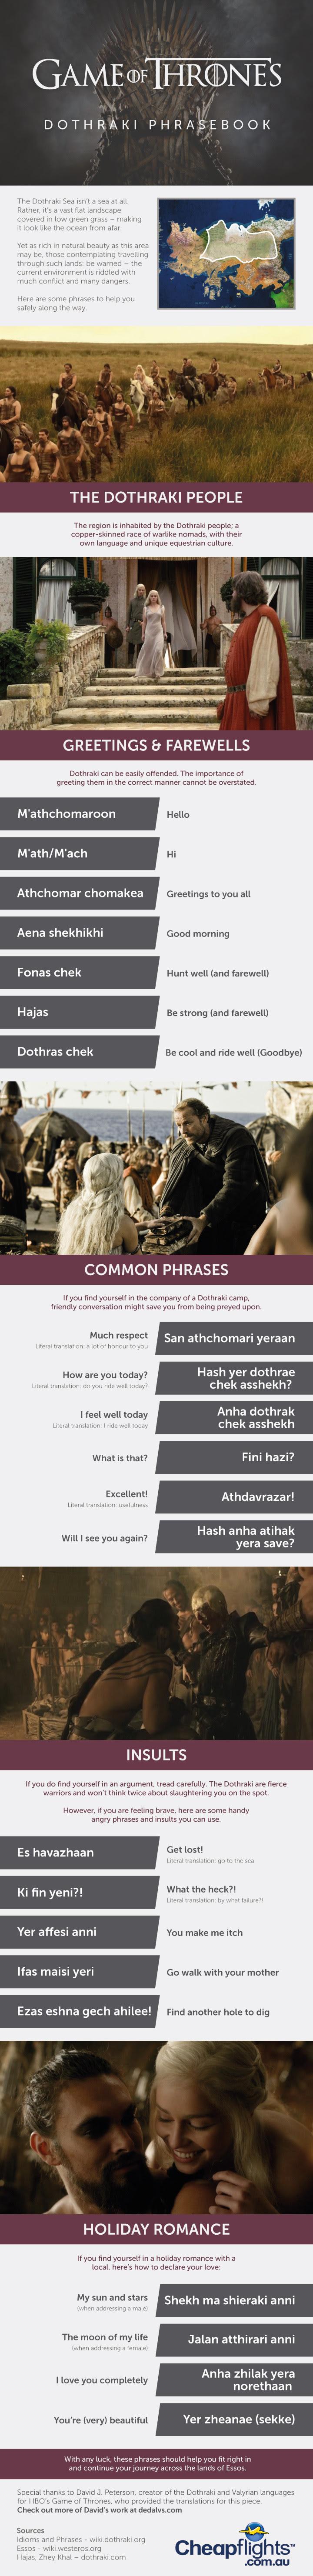 Infographic: Game of Thrones Dothraki Phrasebook #infographic